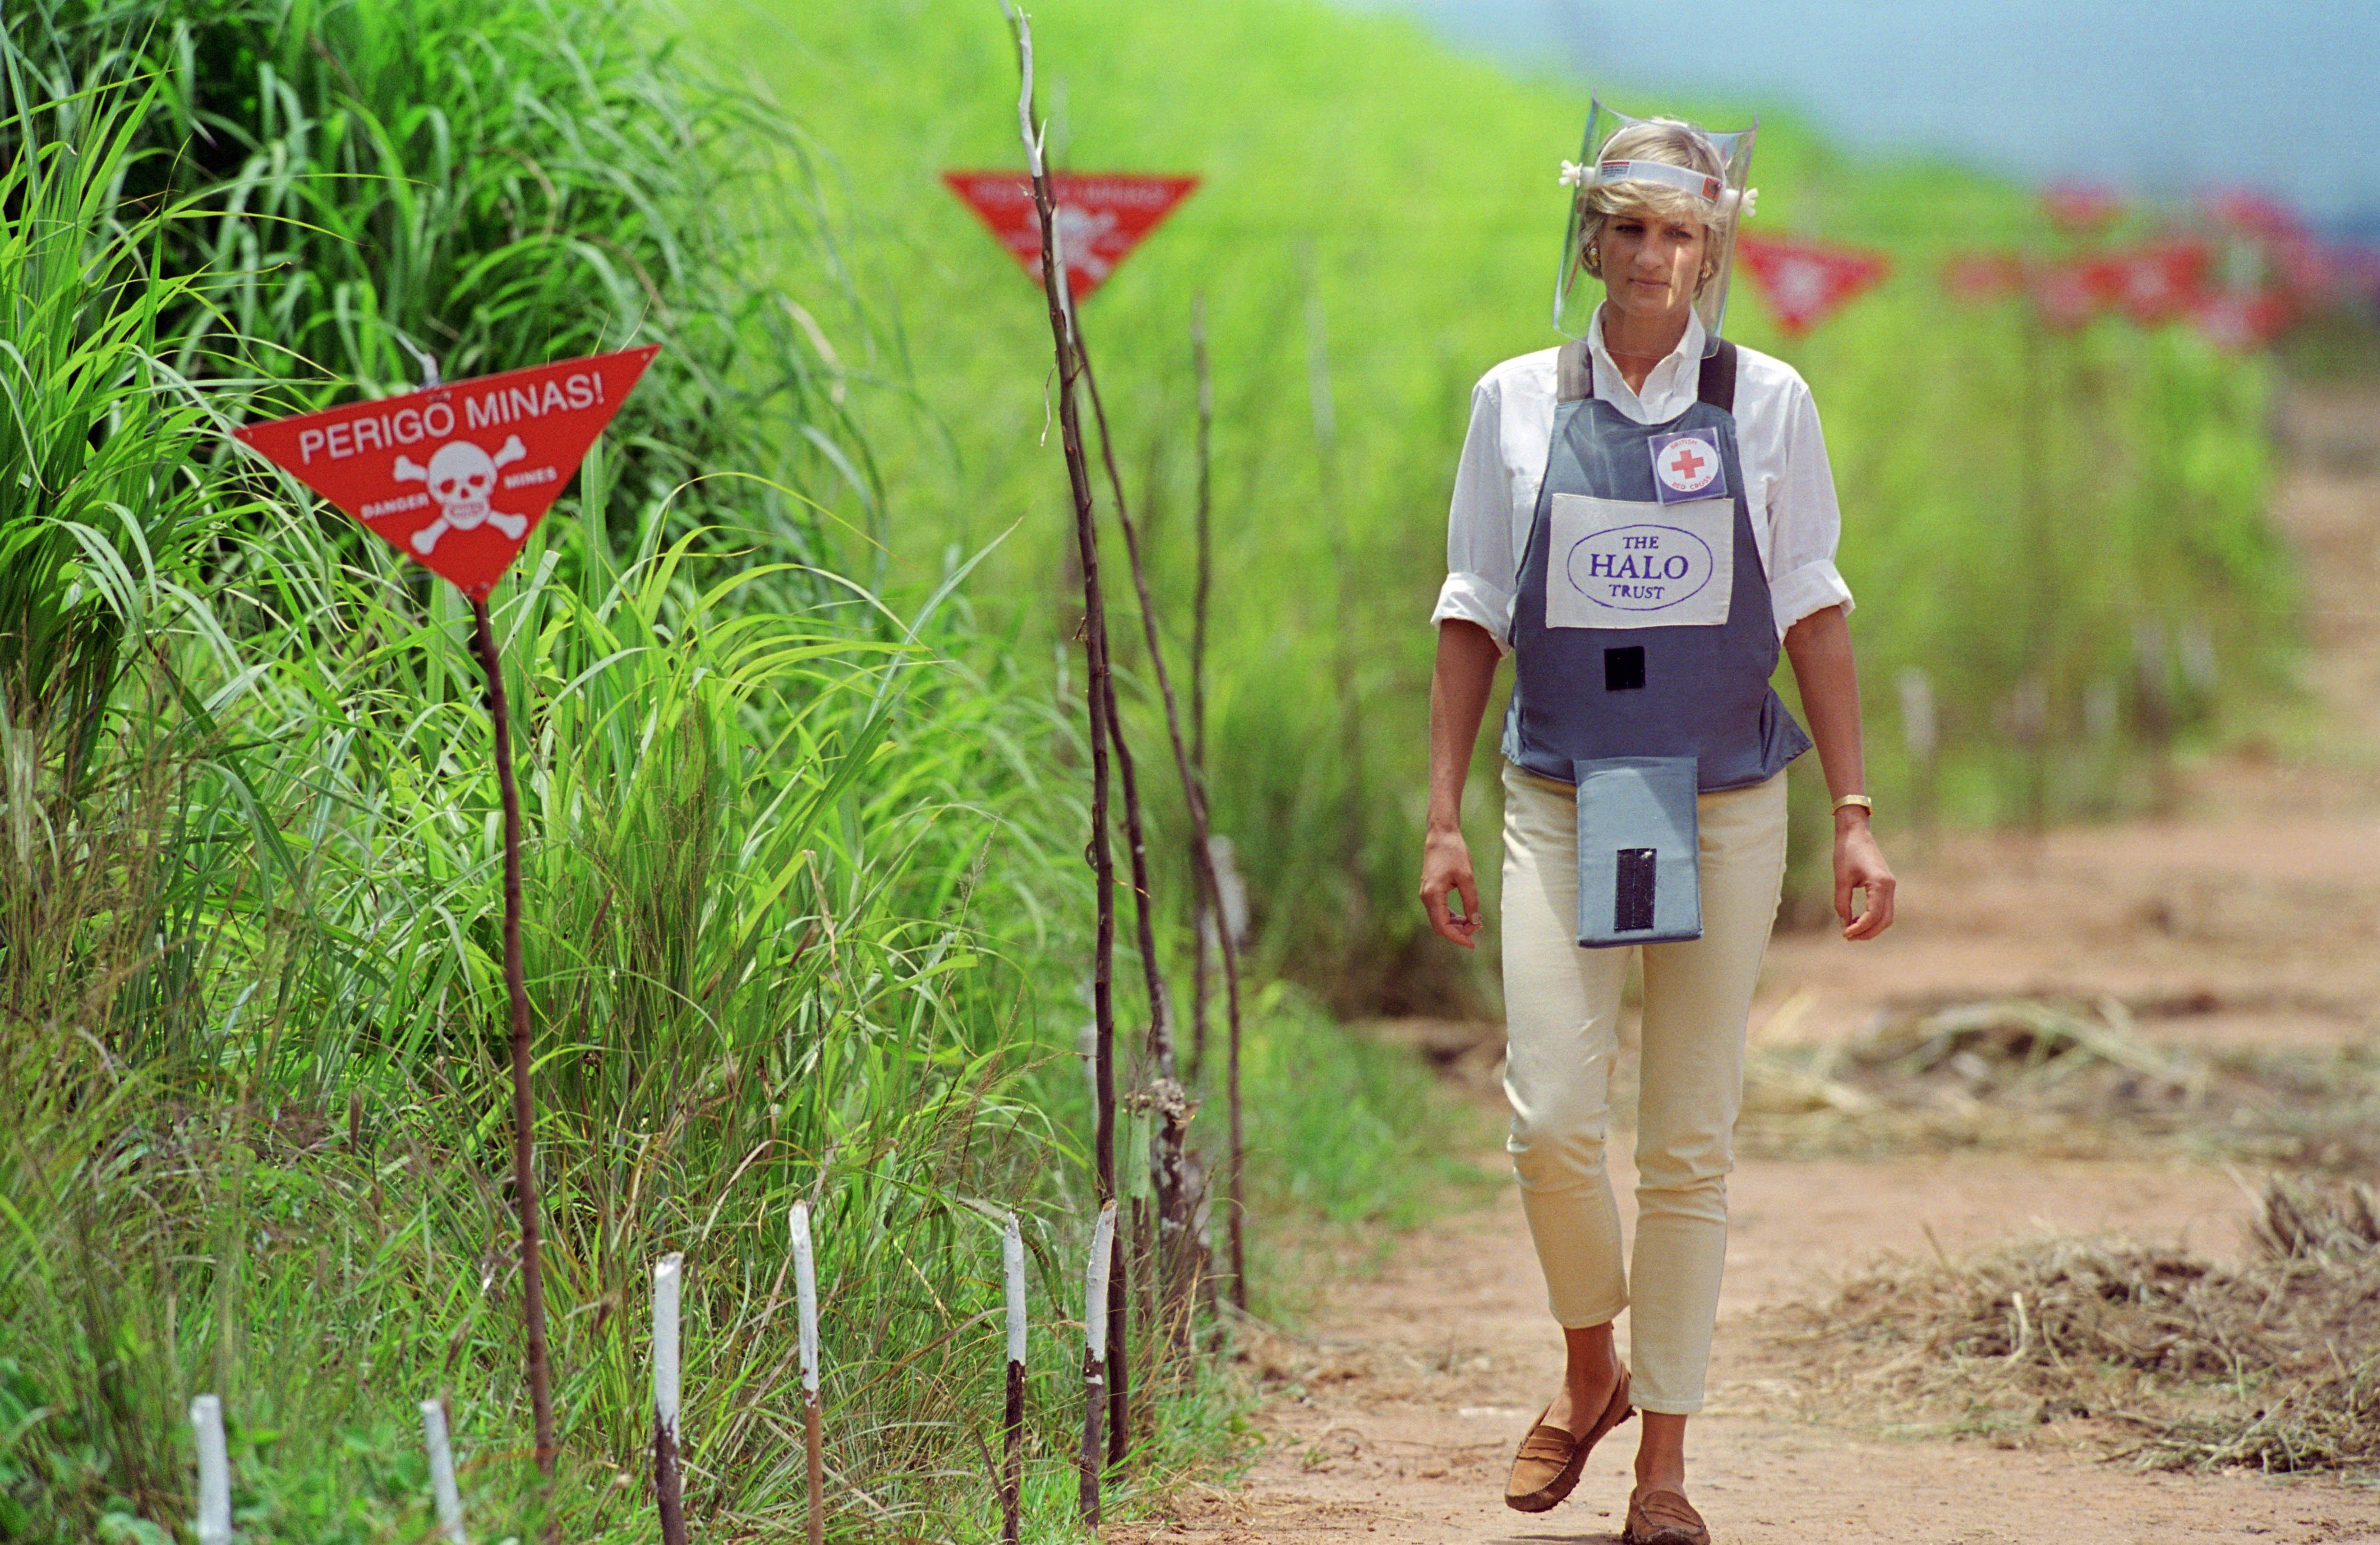 Diana charity work